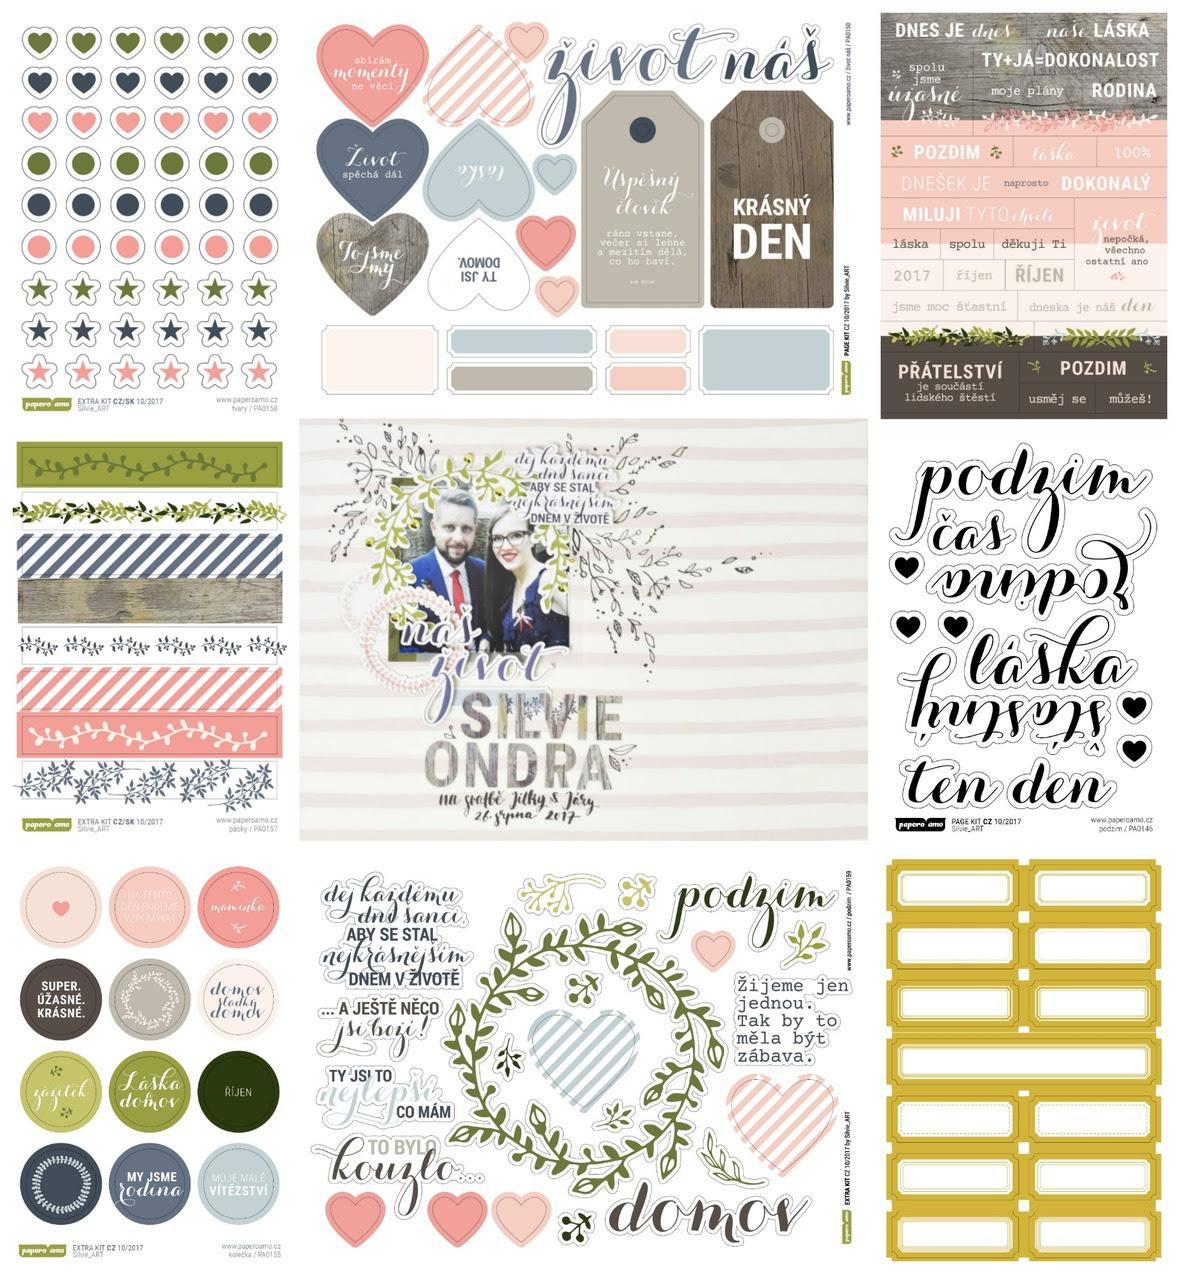 PicMonkey Collage PAGE A EXTRA RIJEN